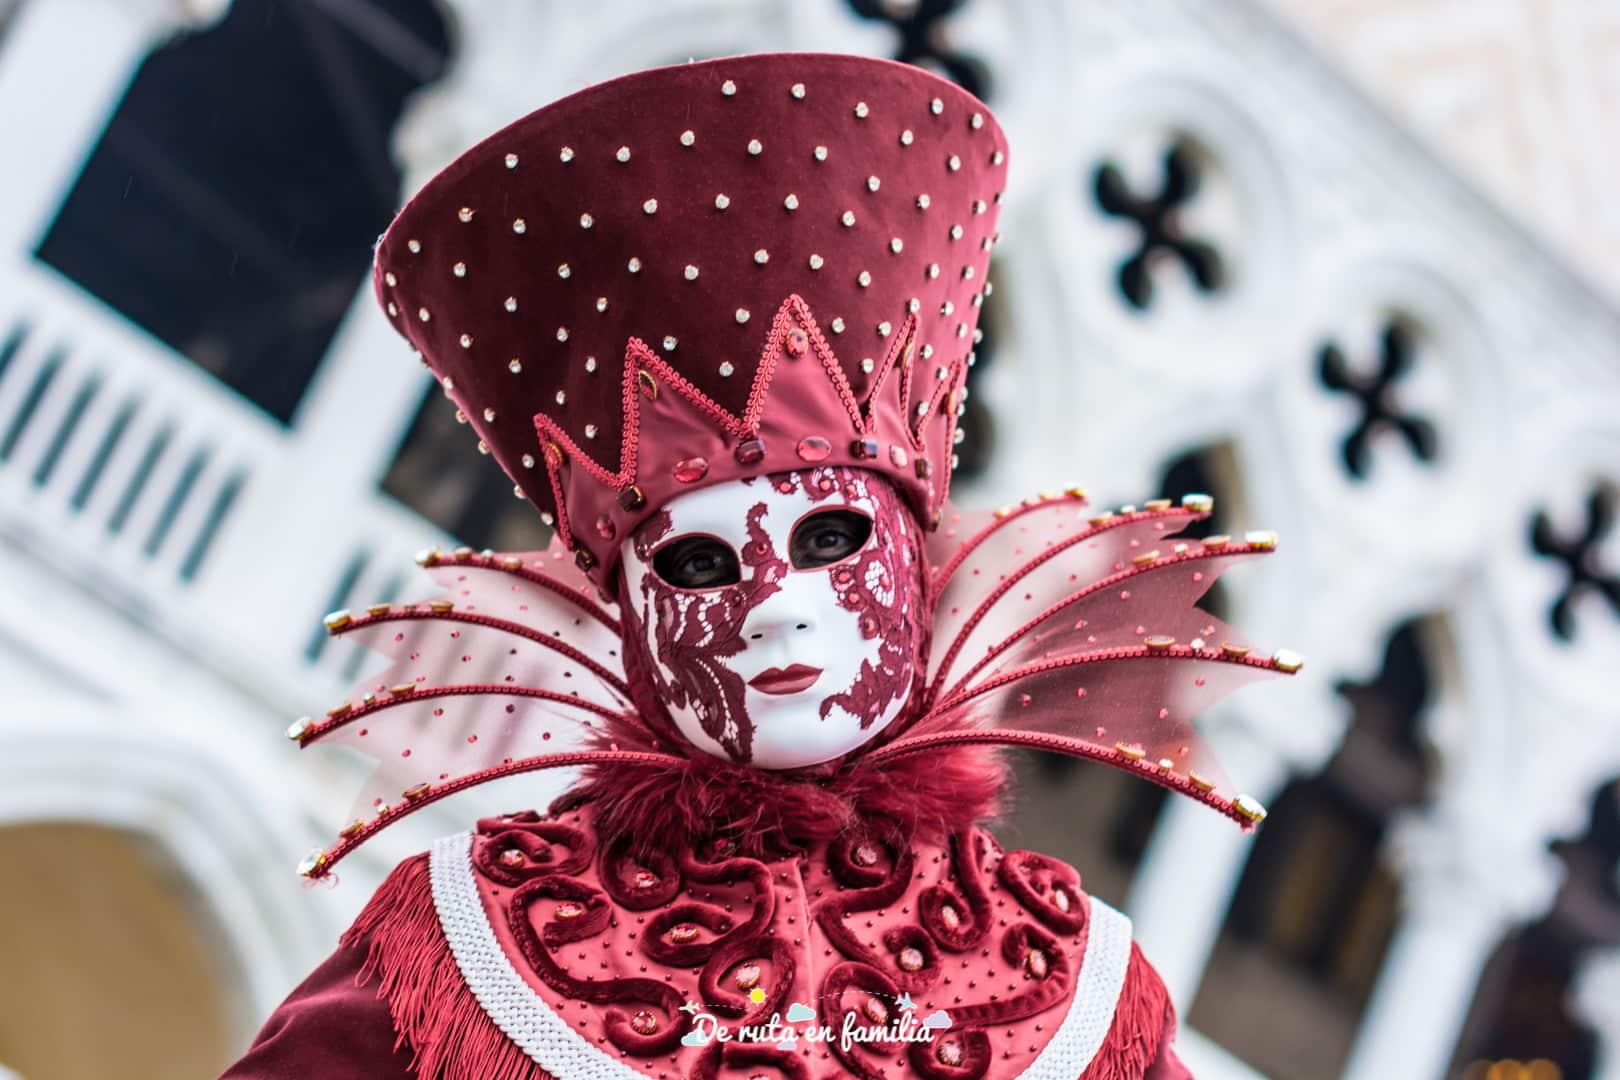 fotos del carnaval de venecia